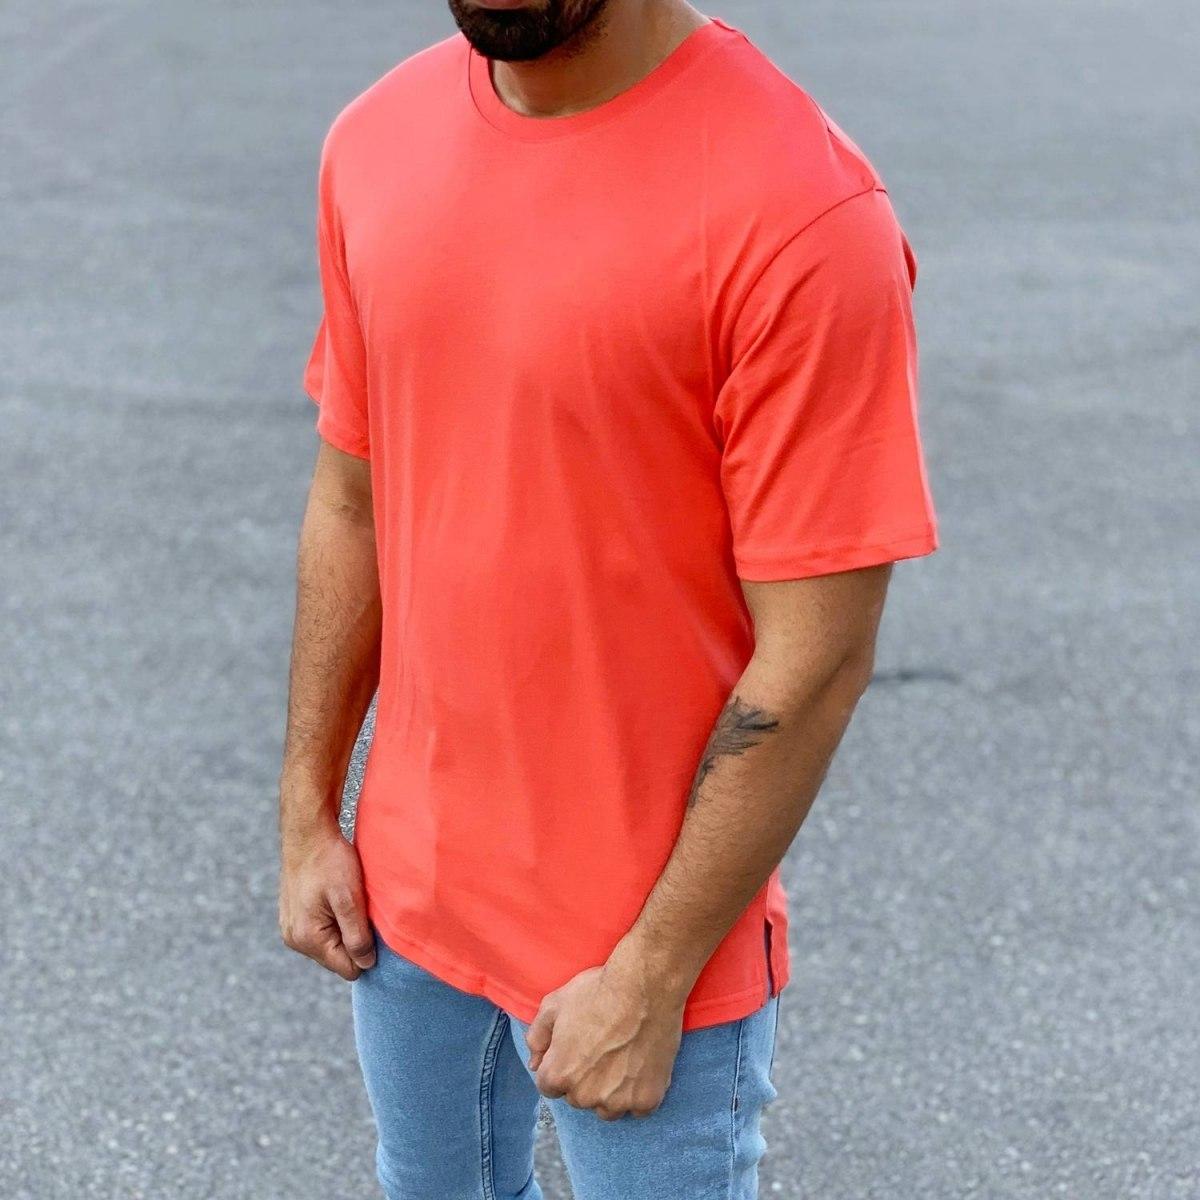 Men's Basic Round Neck T-Shirt In New Red Mv Premium Brand - 2